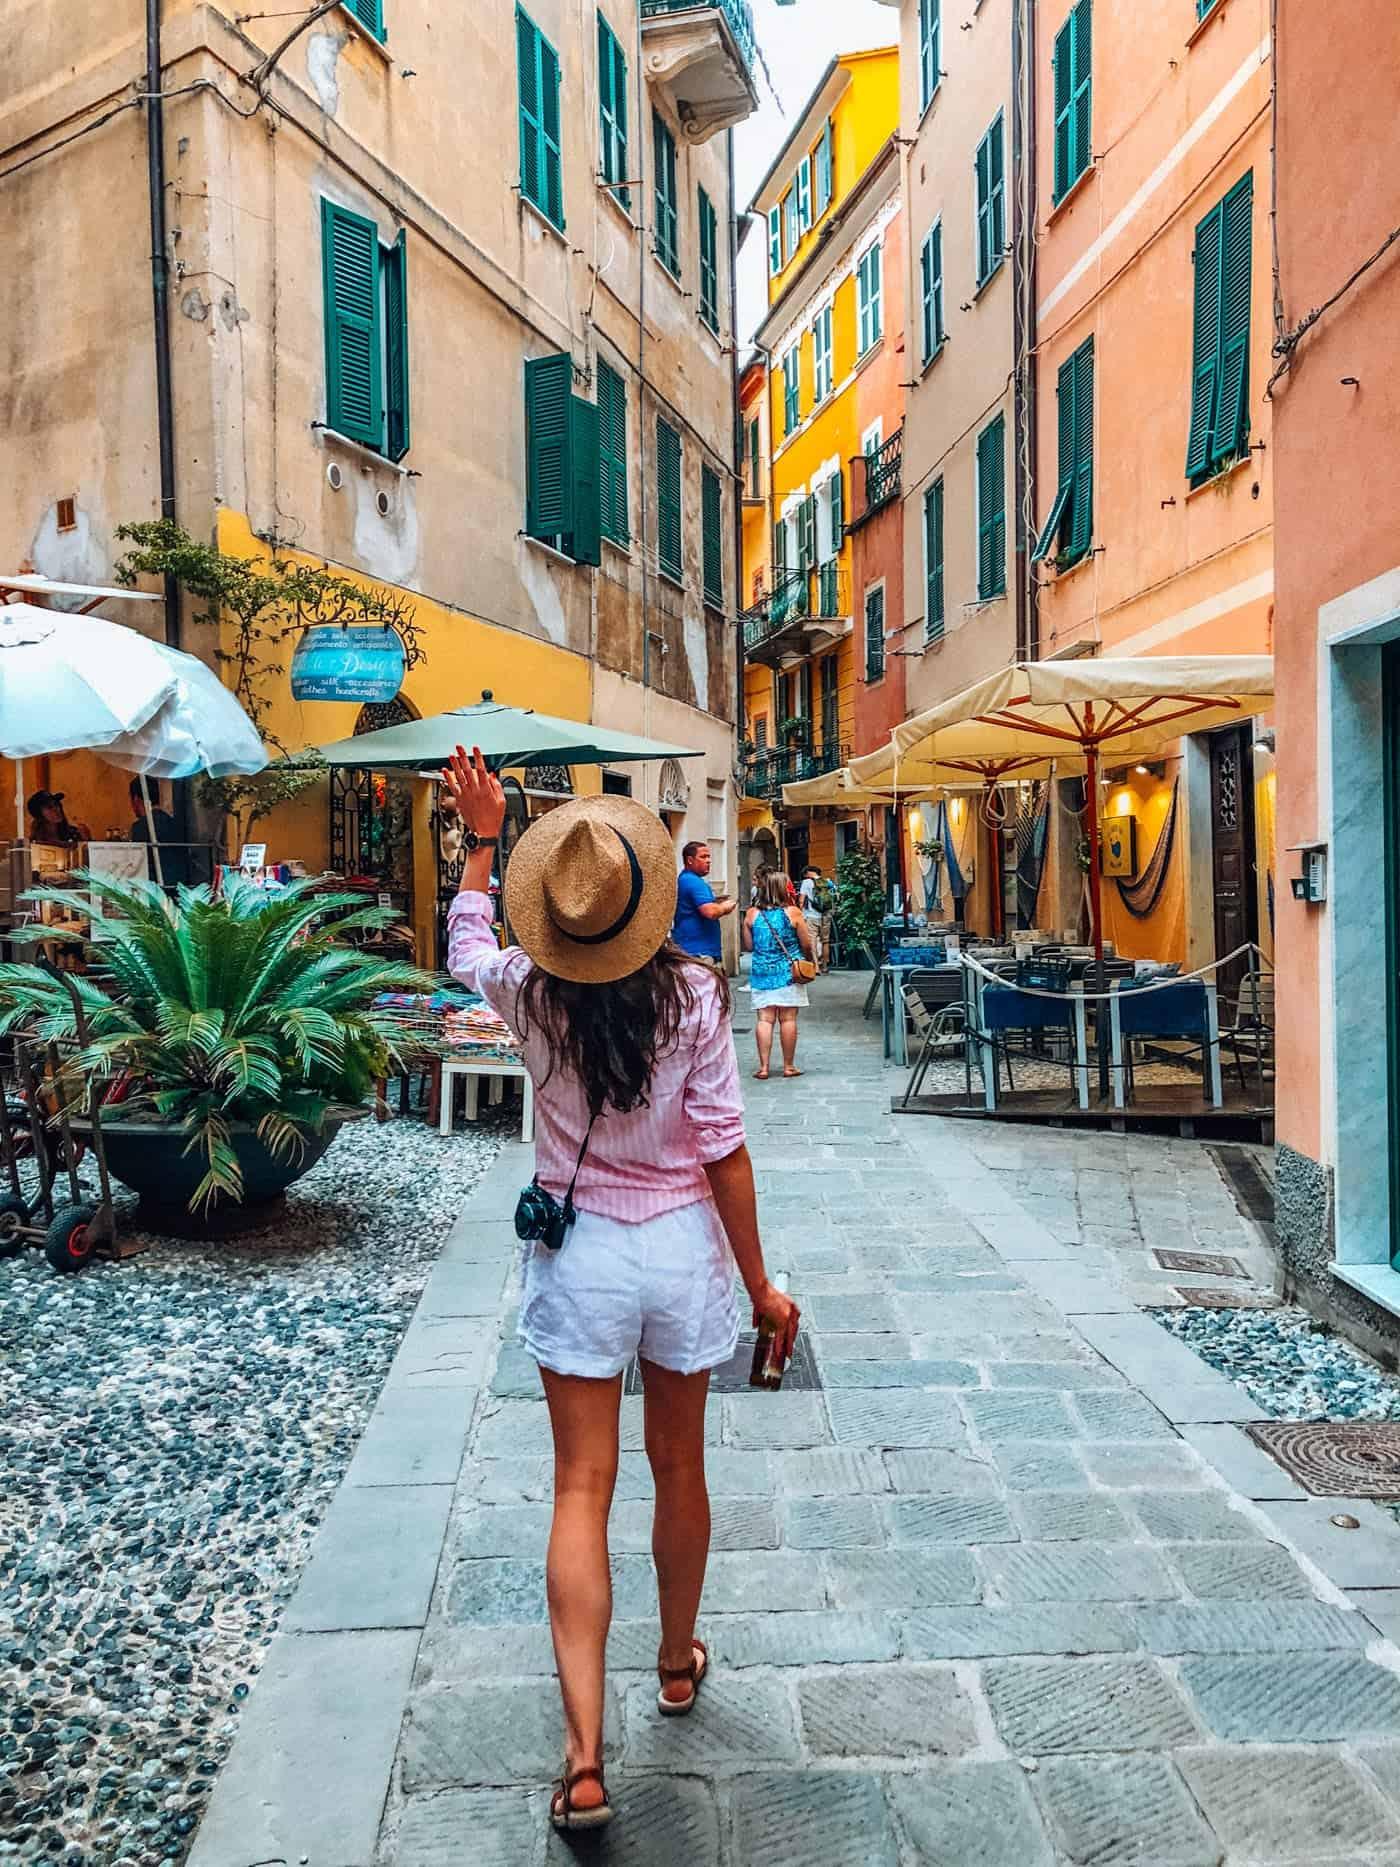 White Linen shorts in Cinque Terre